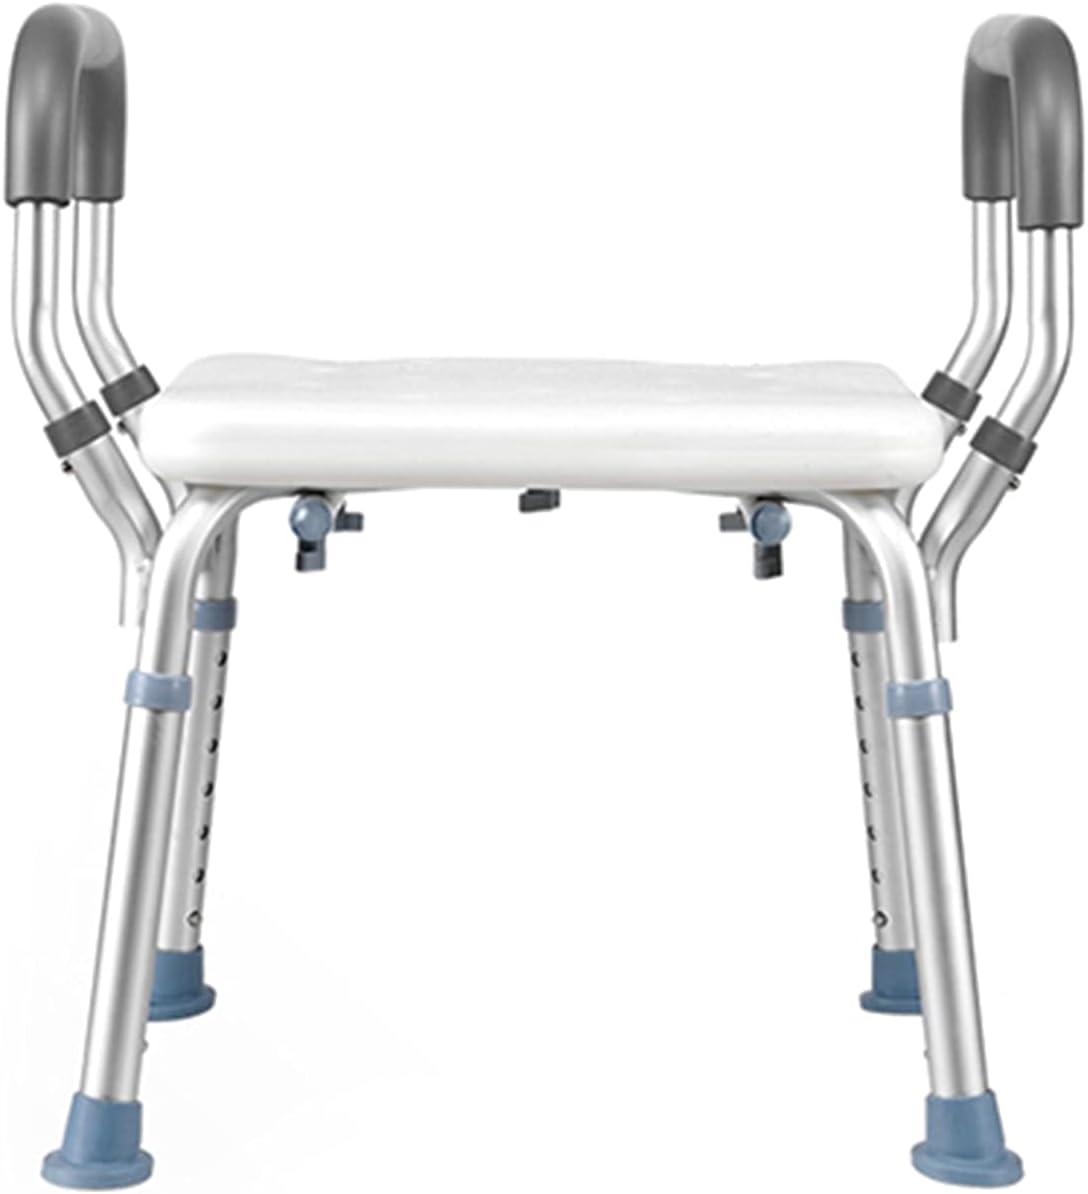 Portable Super Rare intense SALE Shower Chair 6 Levels wit Adjustable Stools Tub